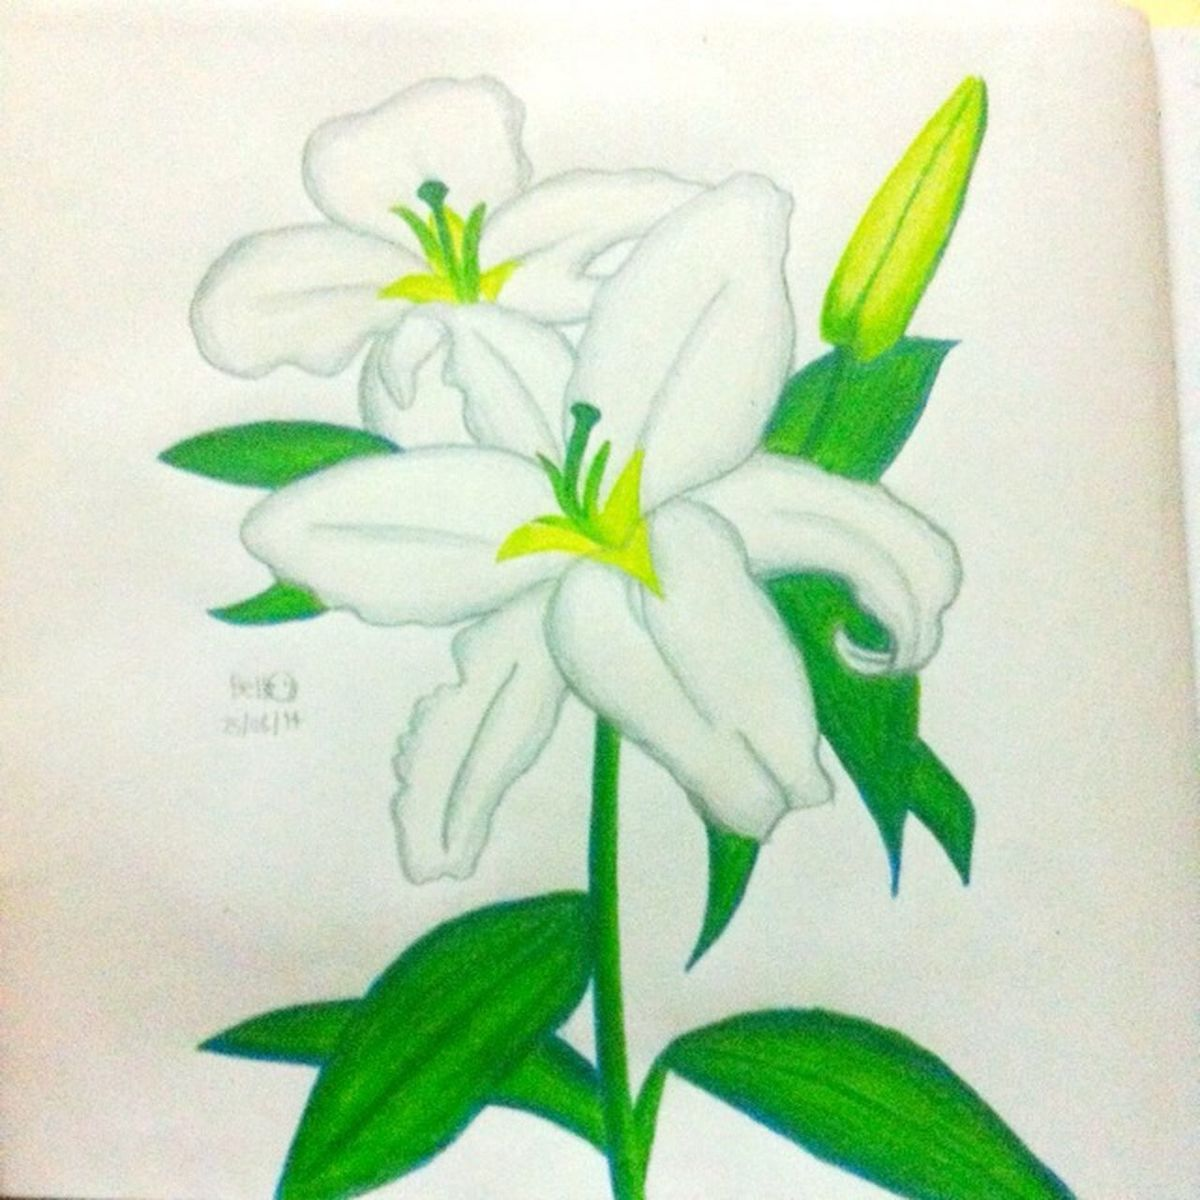 Lily Flower :-) Lily Flower Natural Drawingbyjb Jingerbelllll